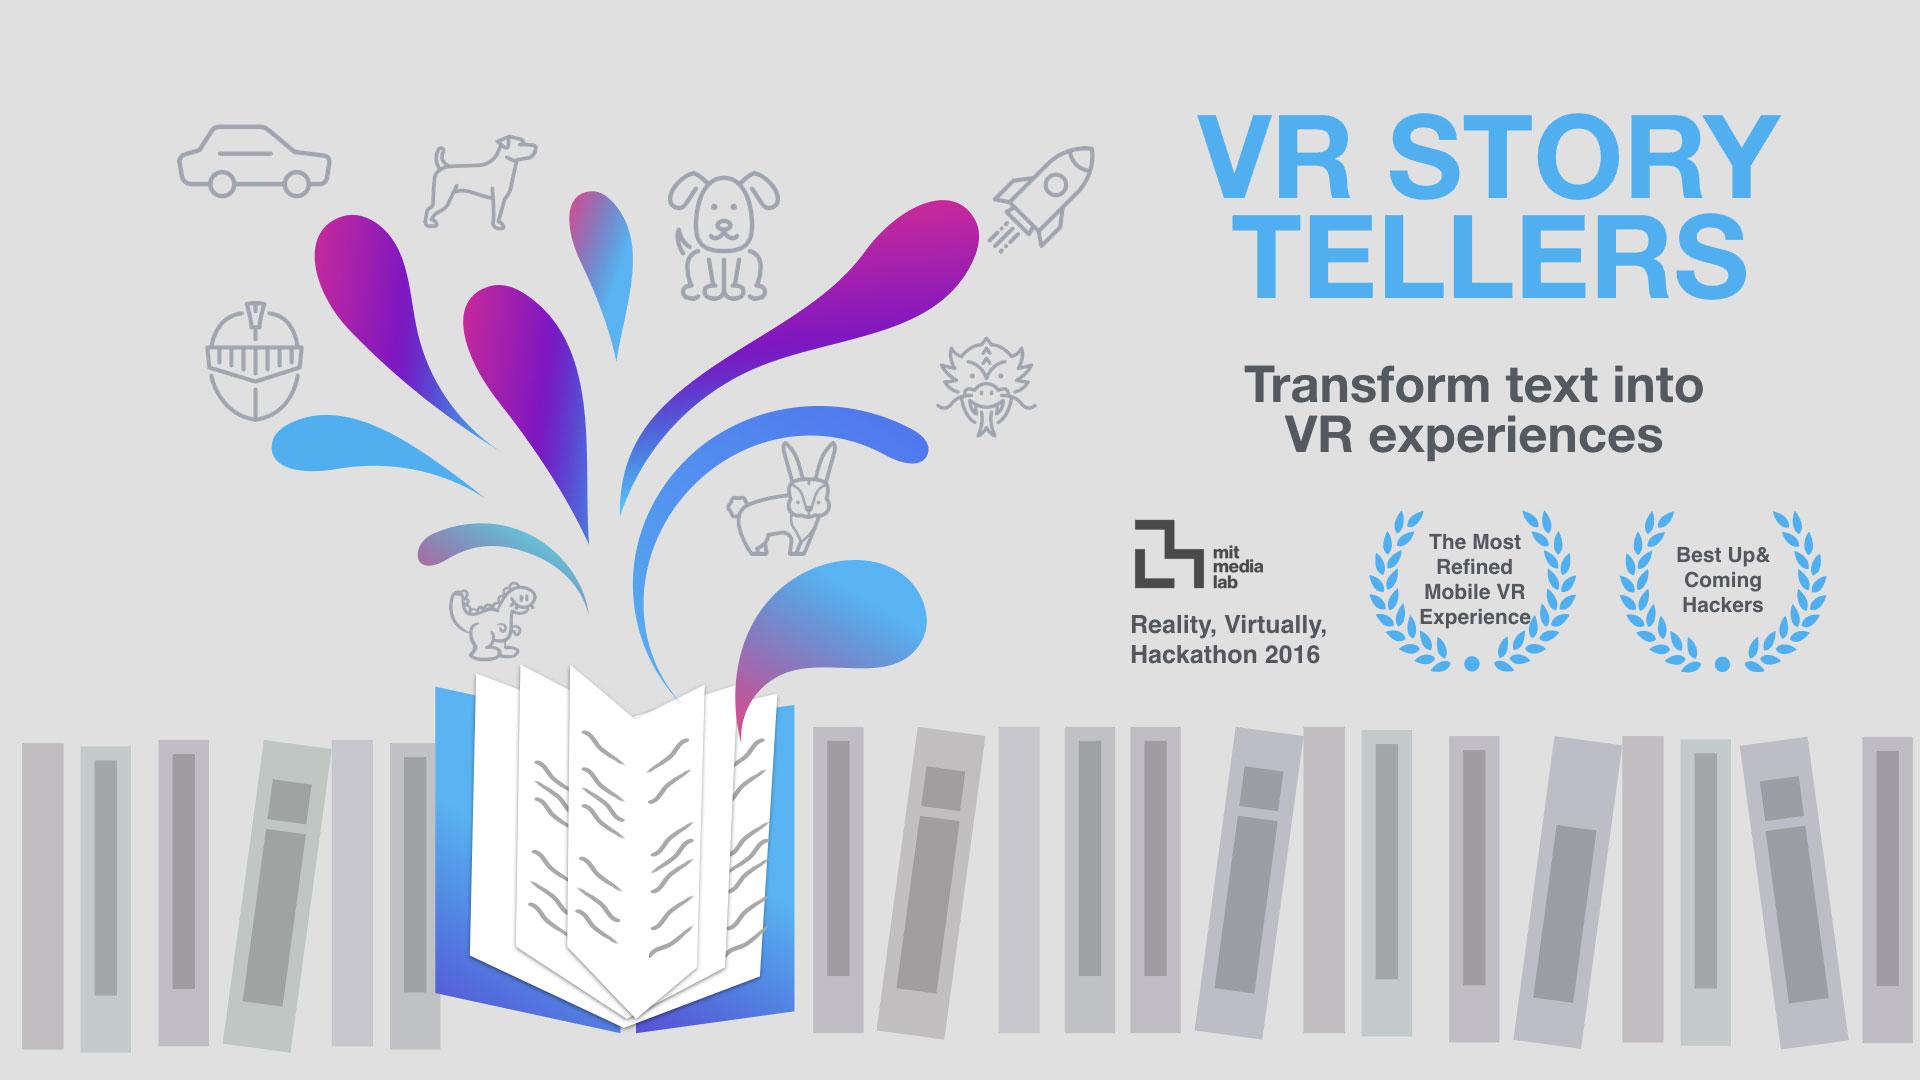 VR Story Tellers